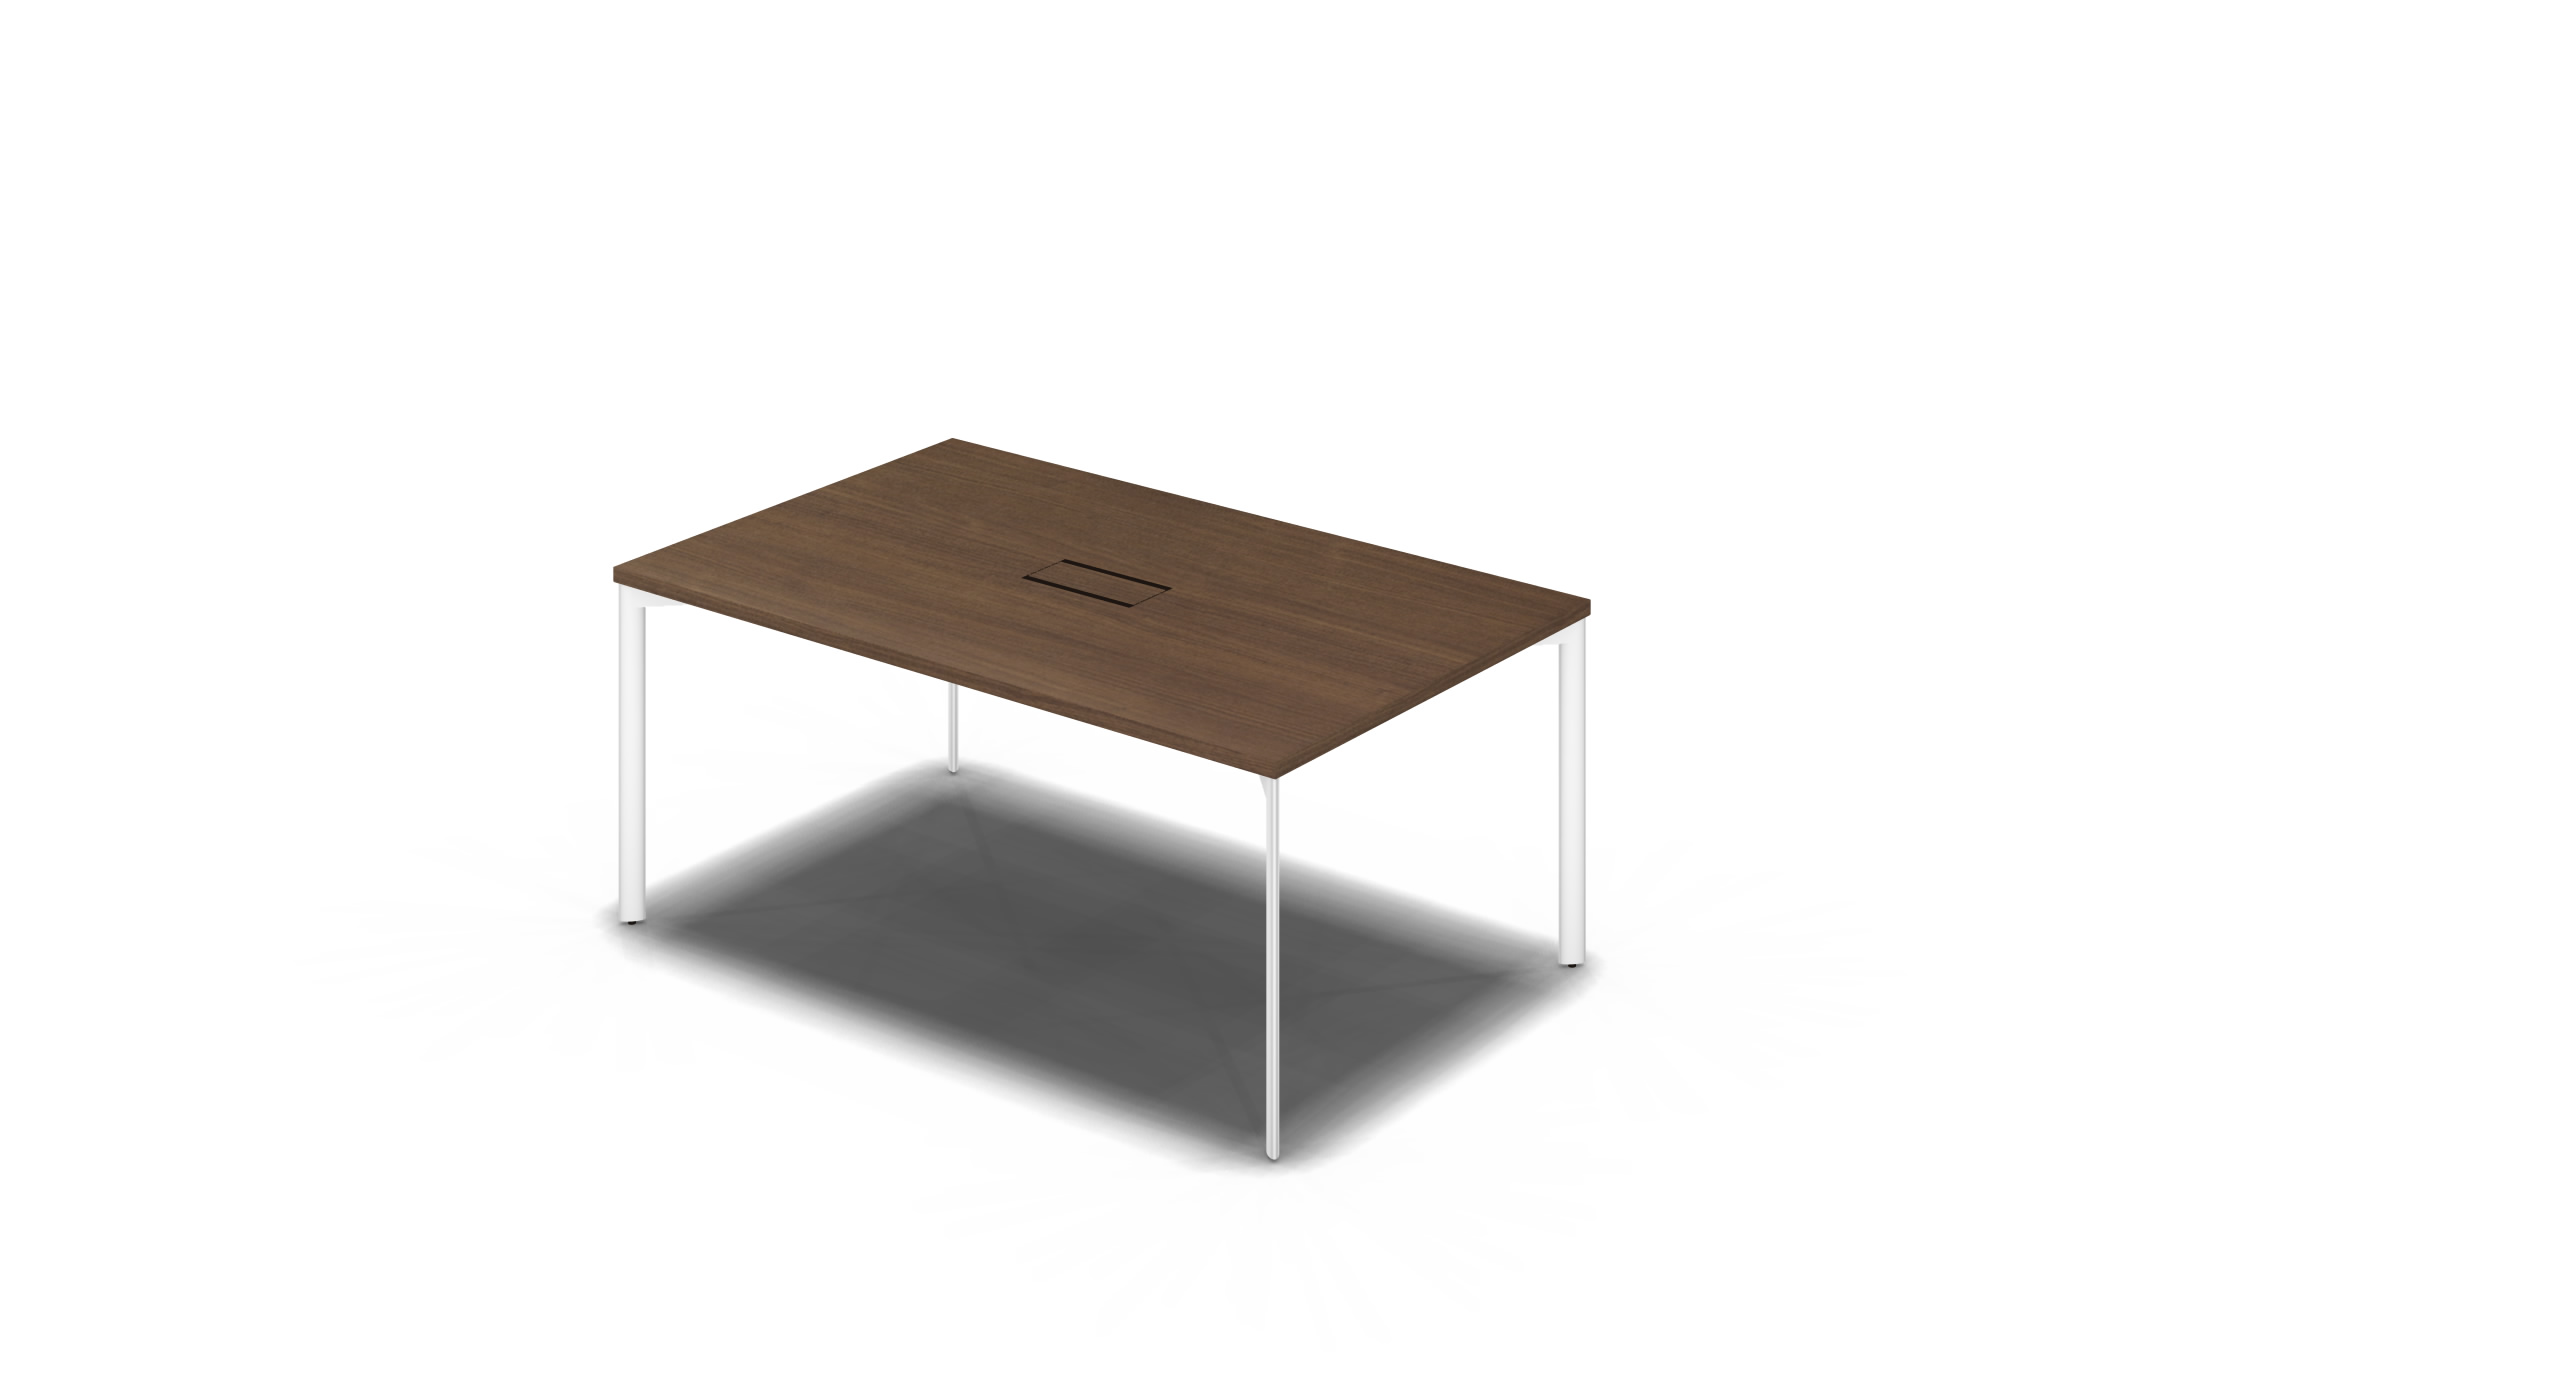 Table_Slim_1500x900_White_Walnut_withOption